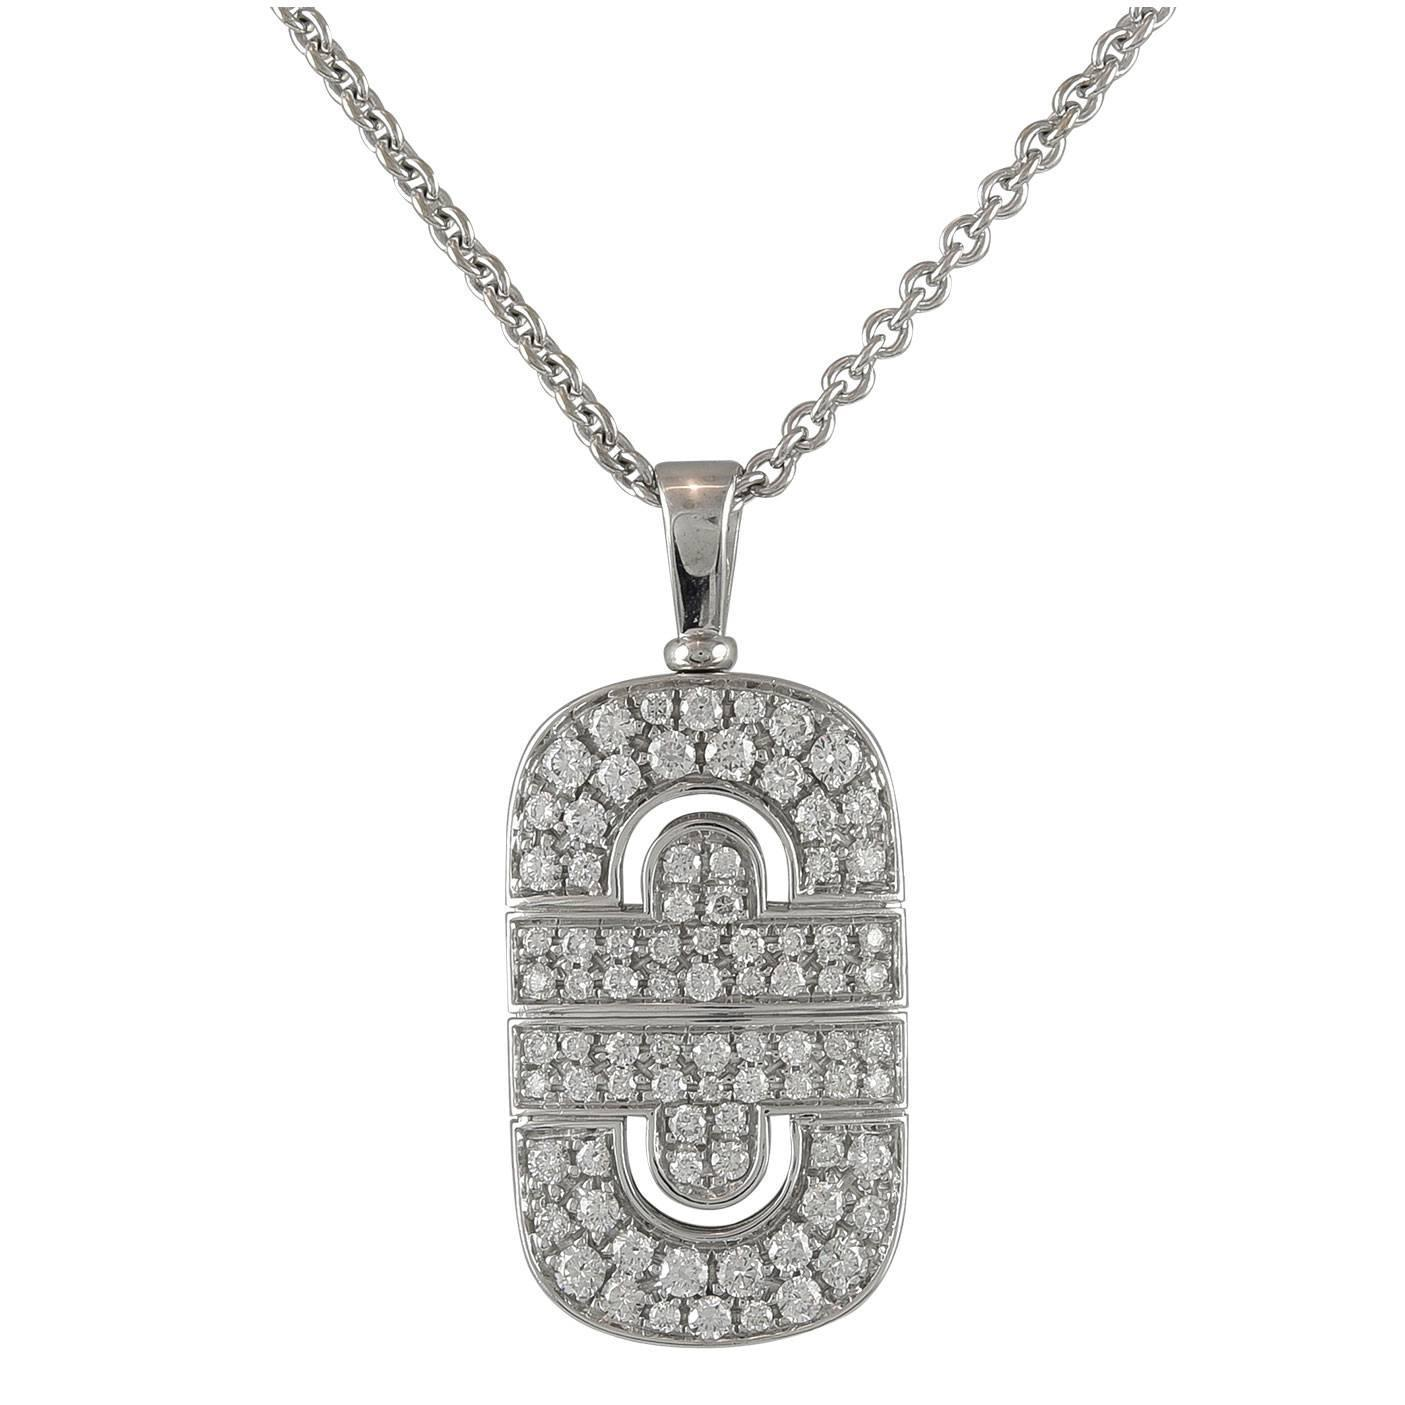 bulgari parentesi pave gold pendant with chain at